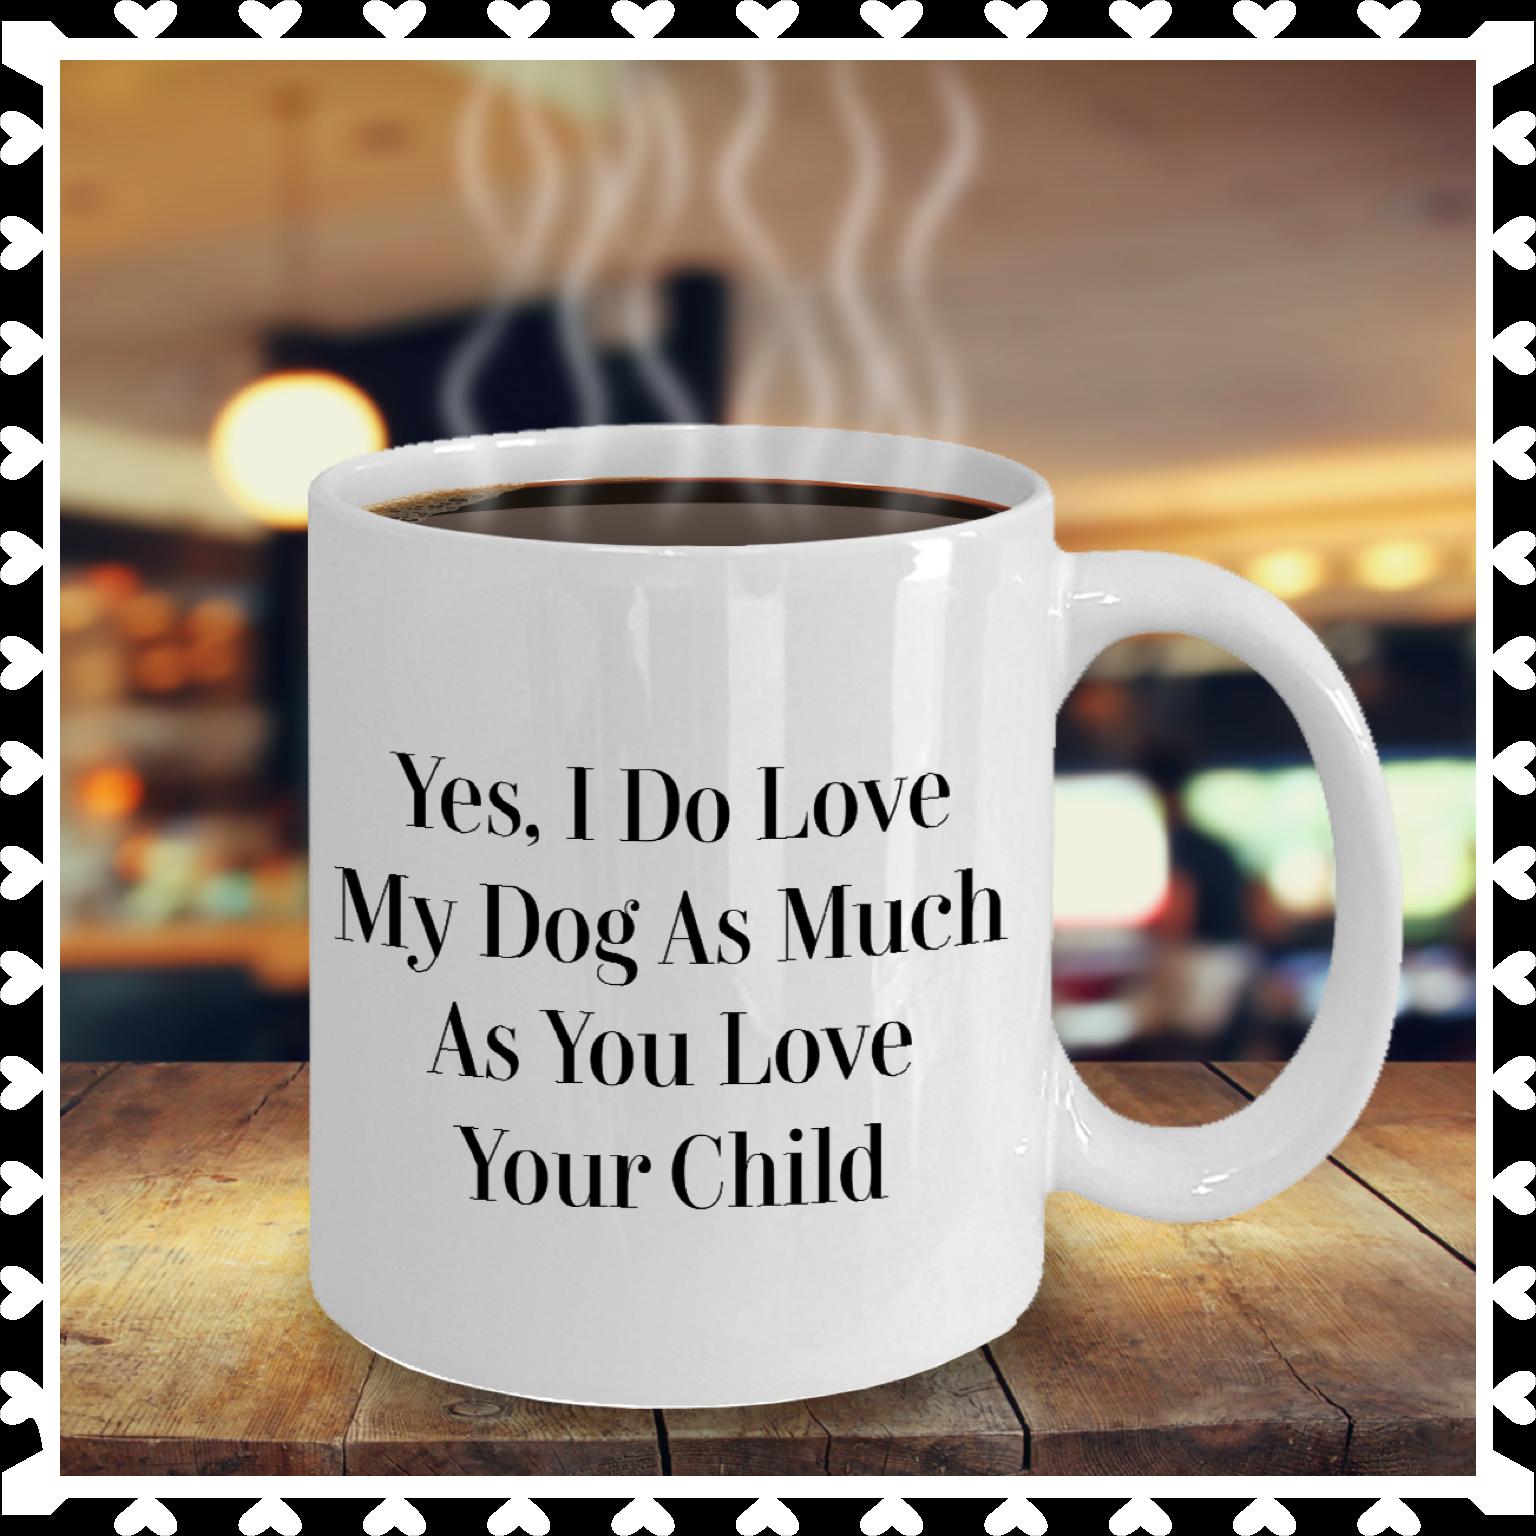 Pin By Gigi On Dogs Mugs Coffee Mugs Funny Coffee Mugs